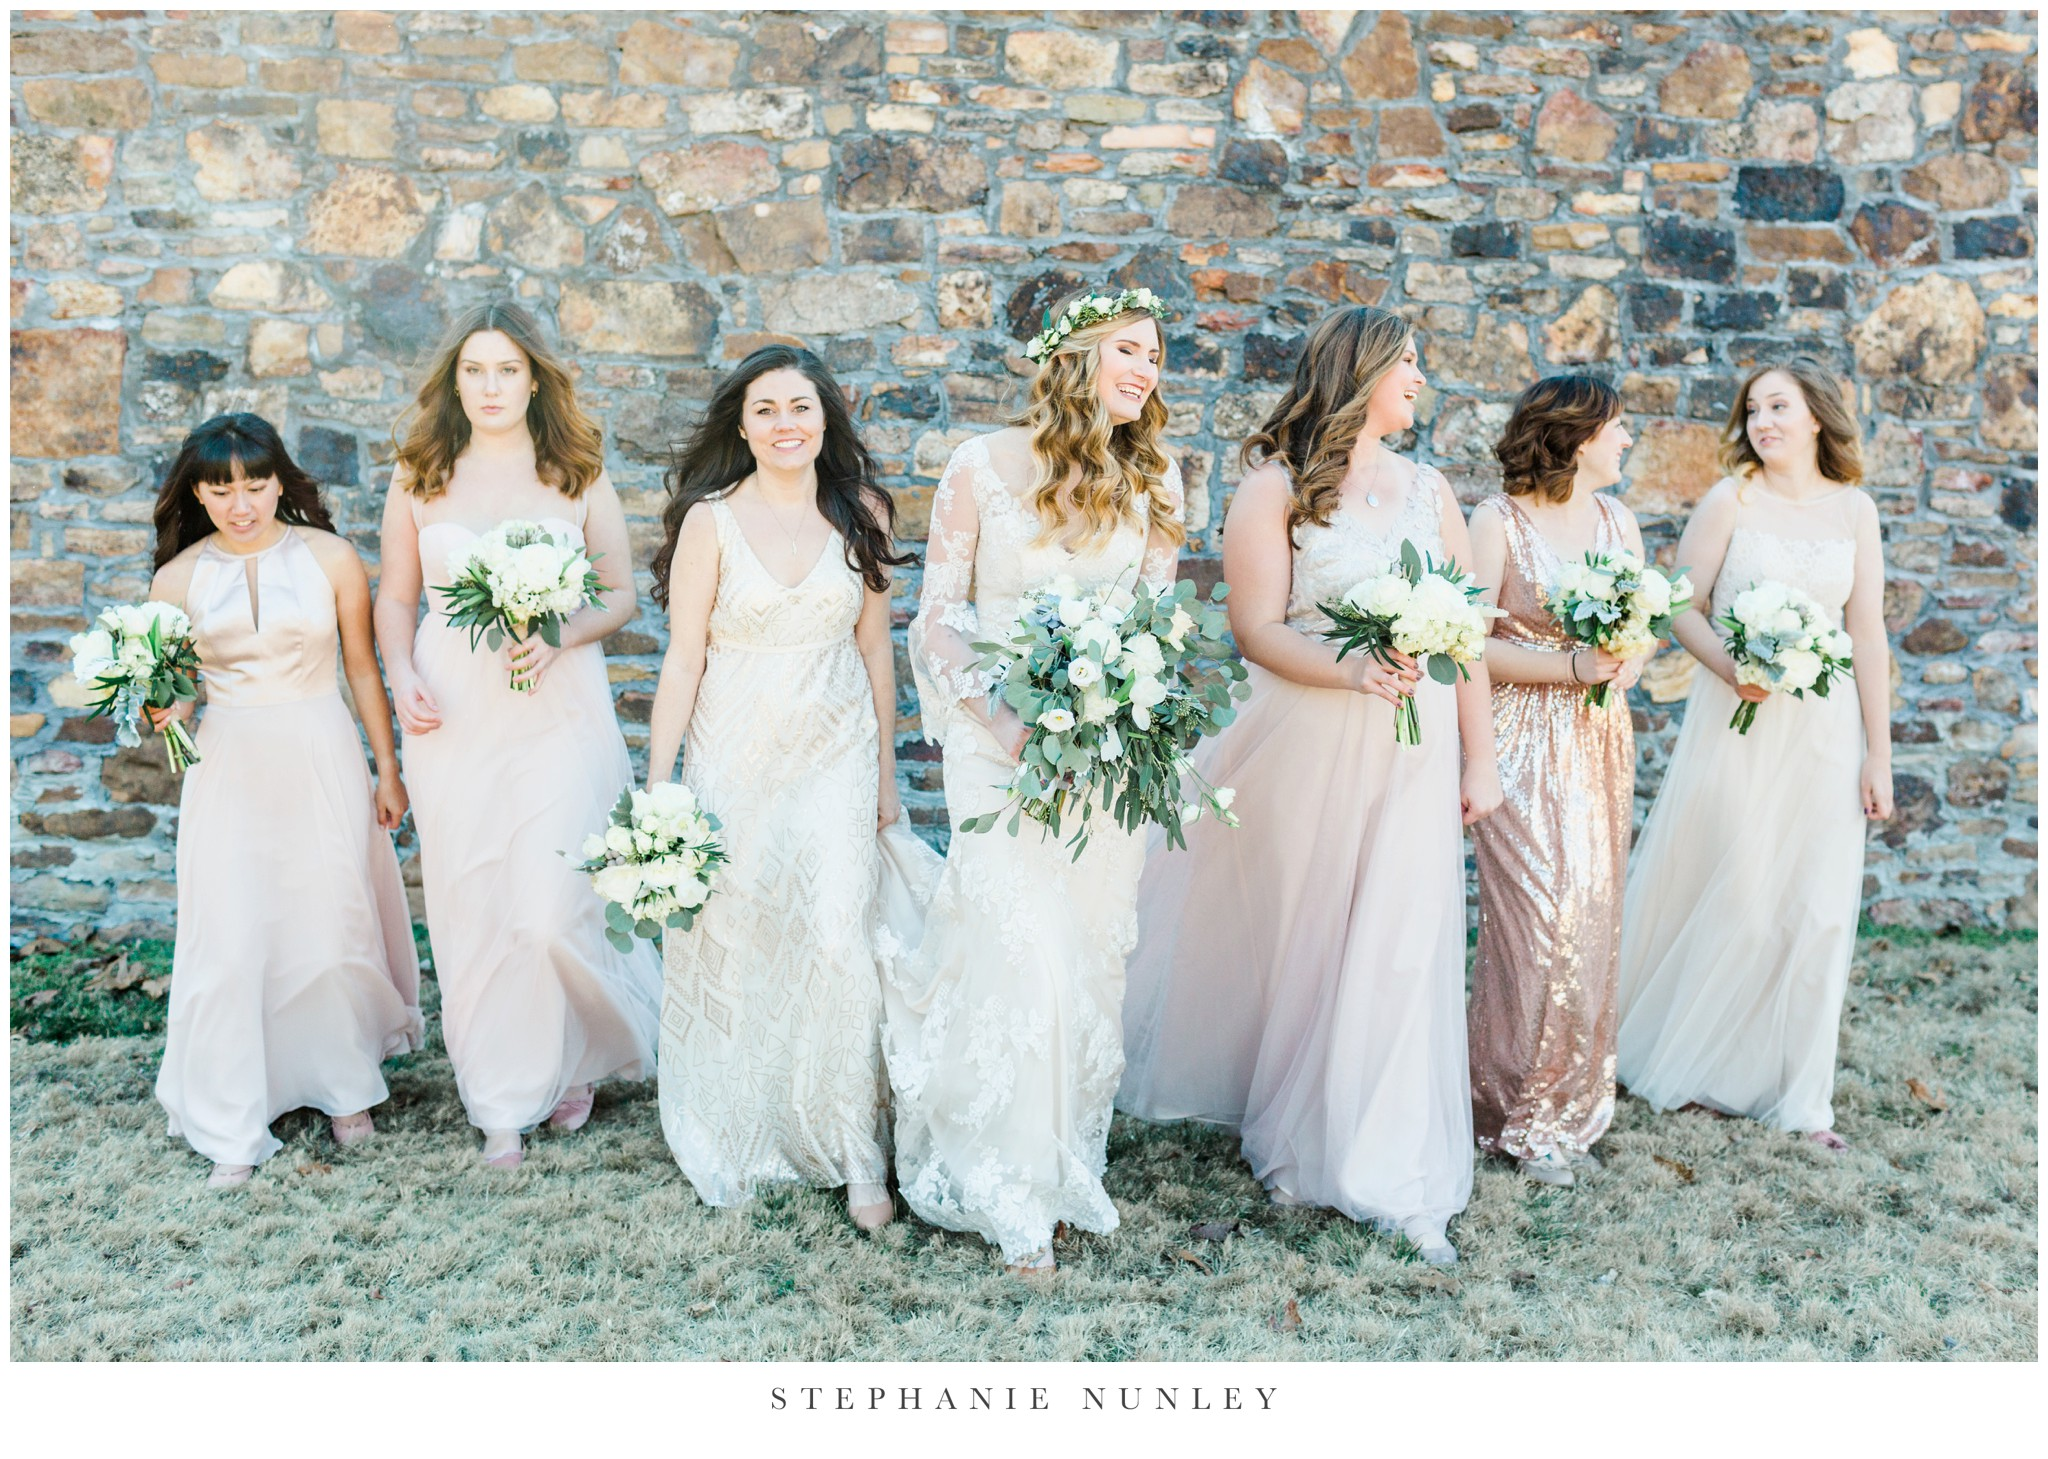 sassafrass-springs-vineyard-film-wedding-photos-50.jpg